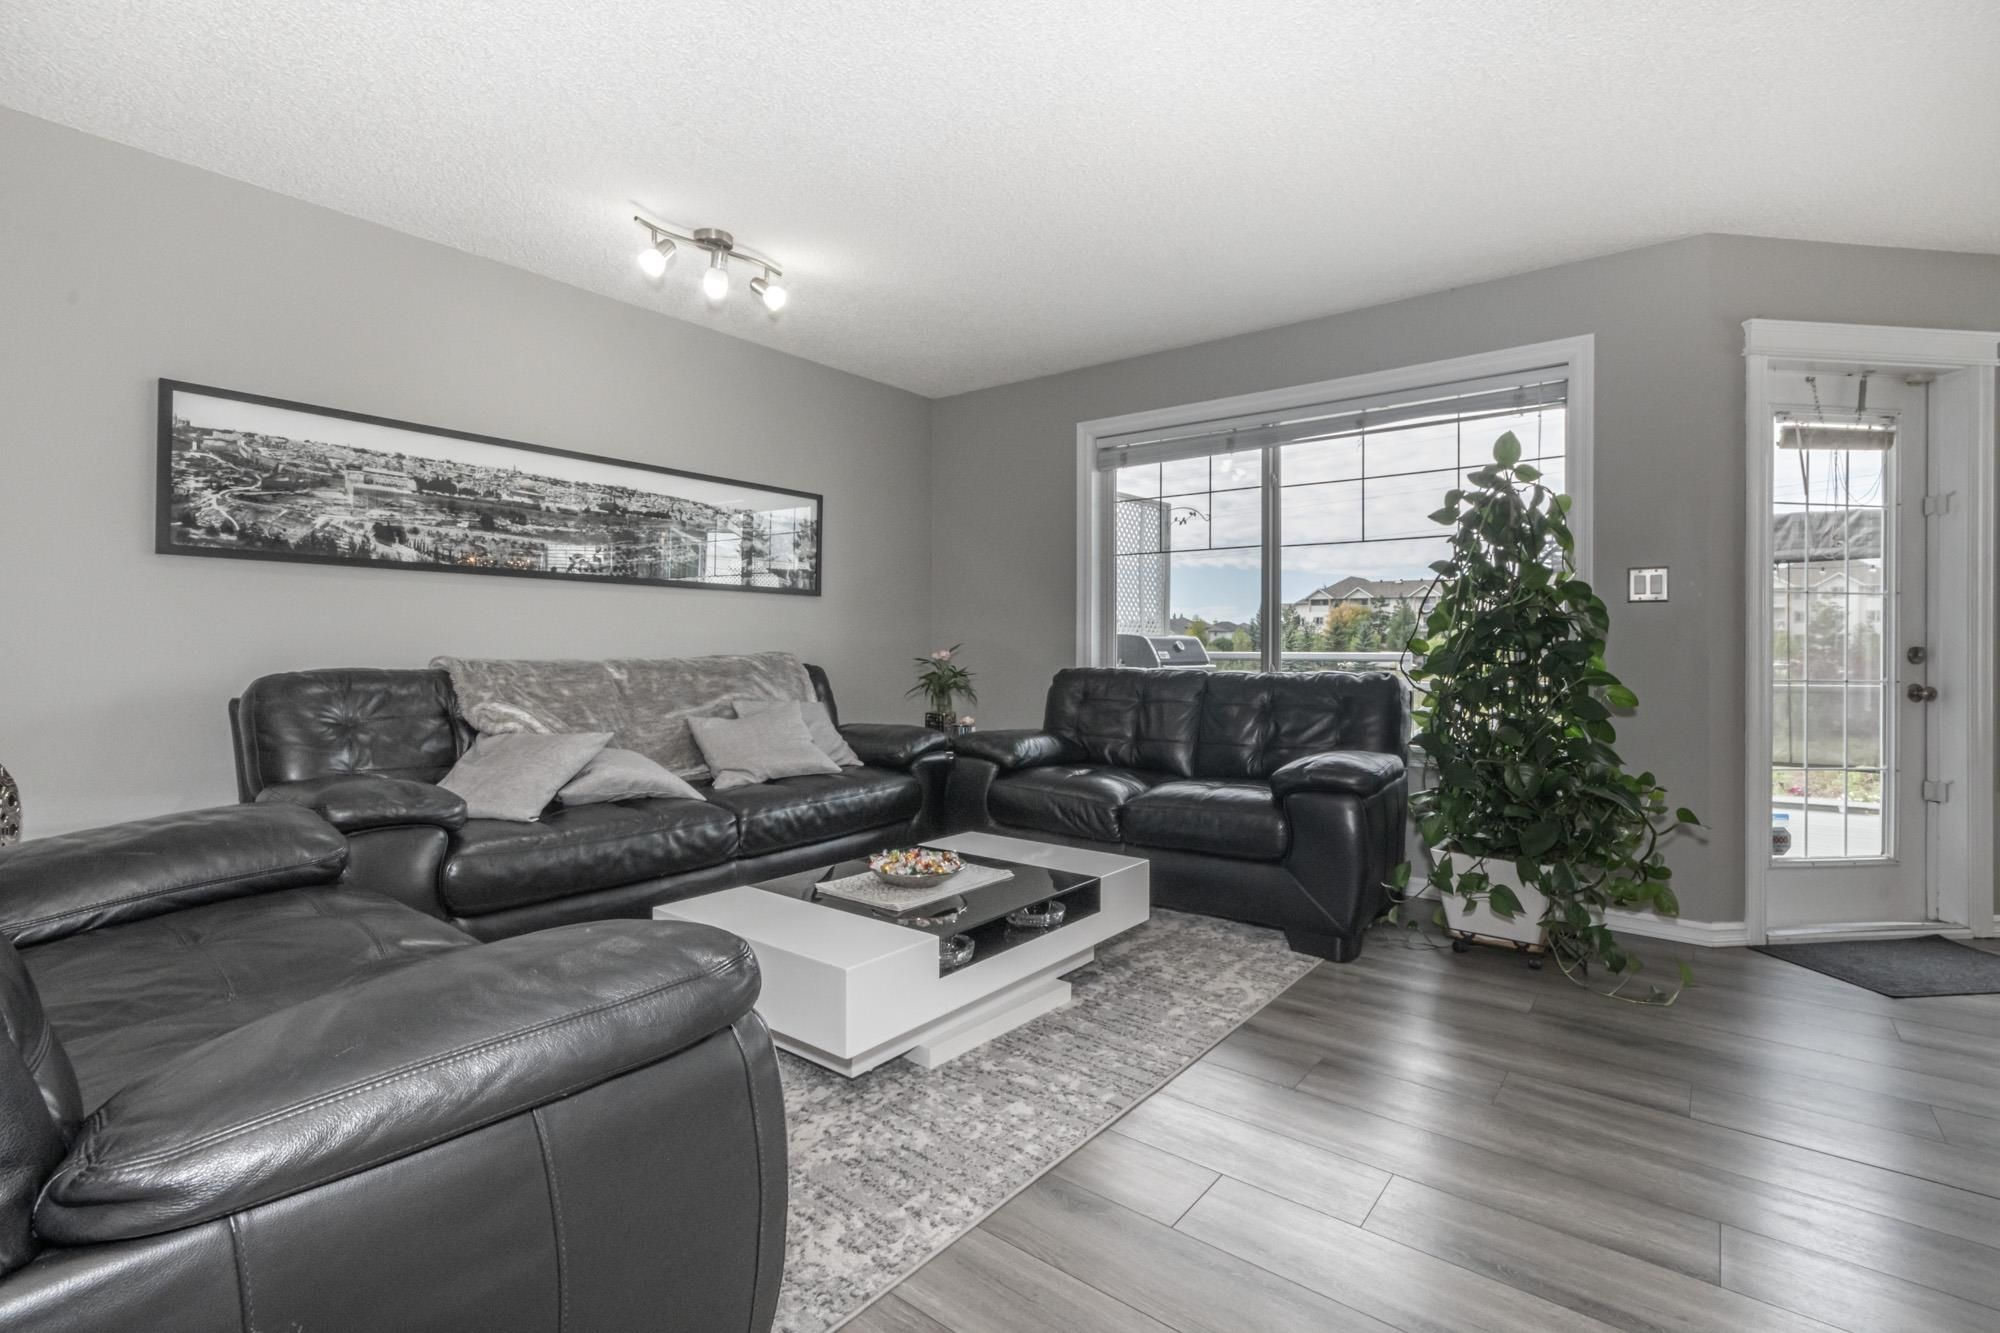 Main Photo: 408 86 Street in Edmonton: Zone 53 House for sale : MLS®# E4261895